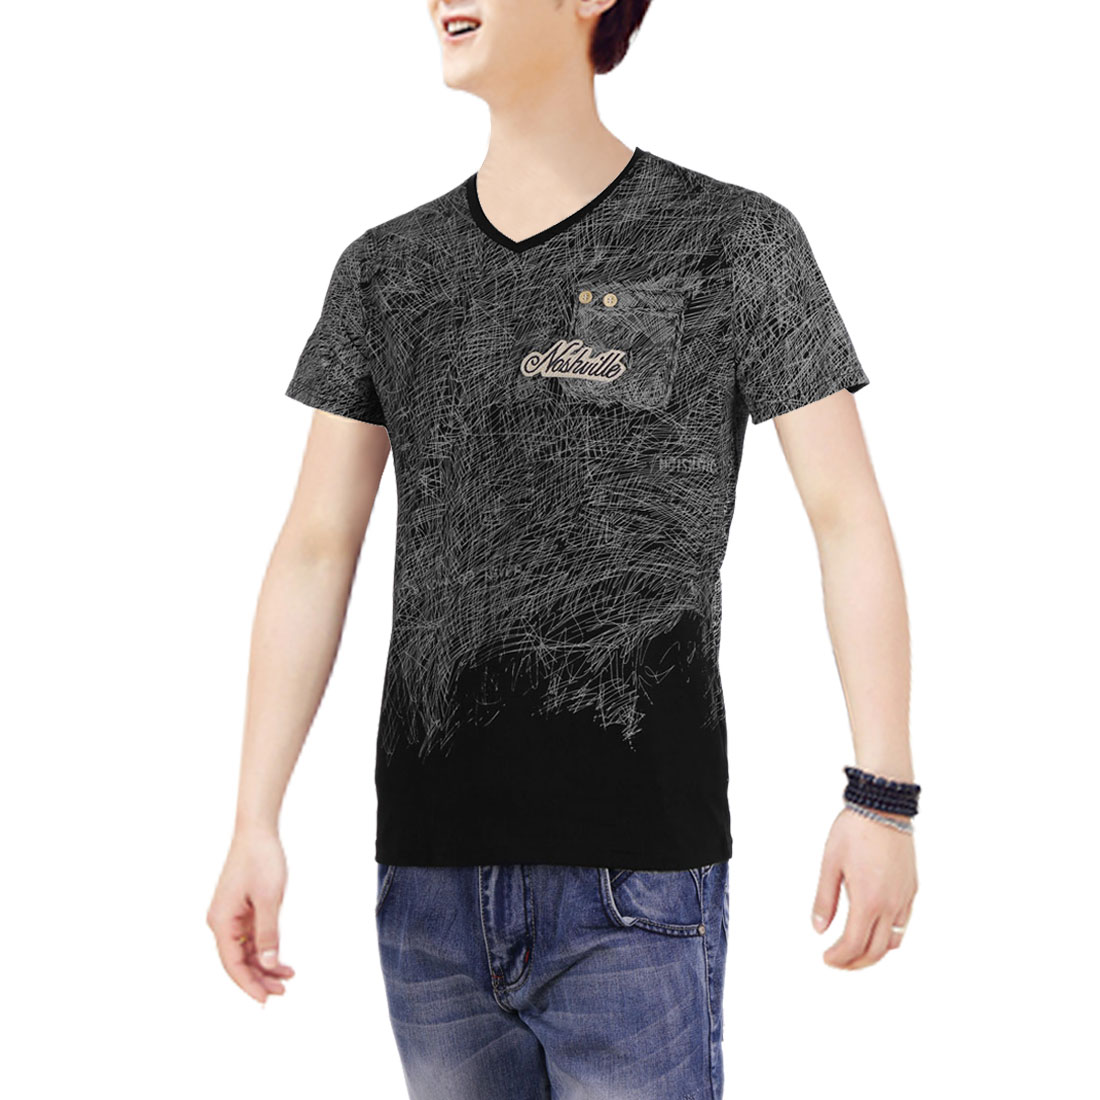 V Neck Graffiti Style Casual Letters Prints T-Shirt for Men Black S